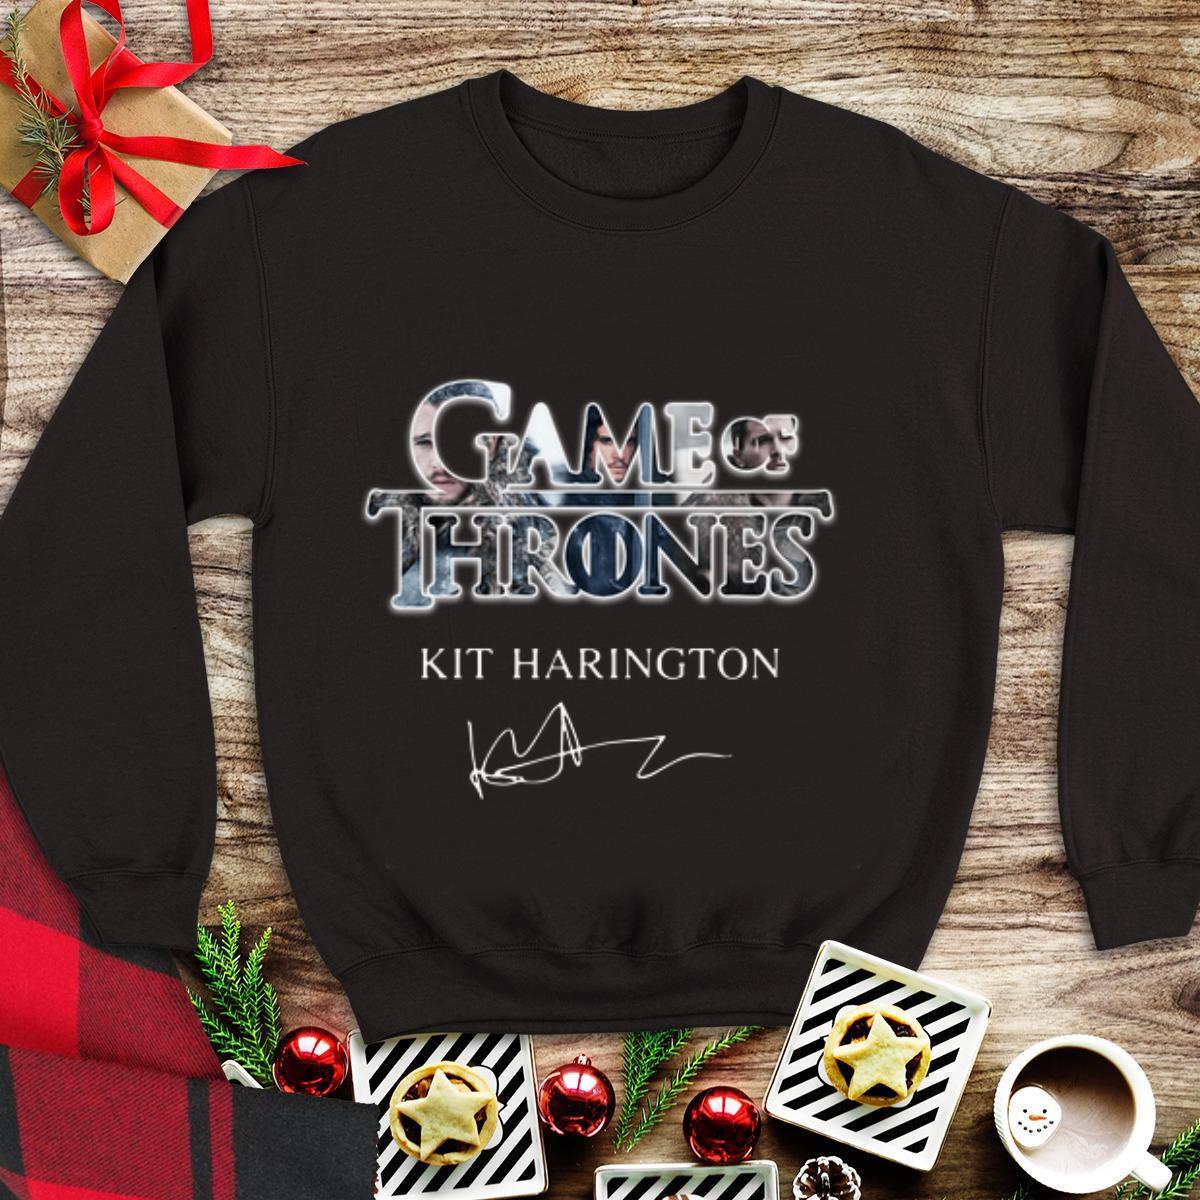 Awesome Kit Harington Jon Snow Game of Thrones Signature shirt